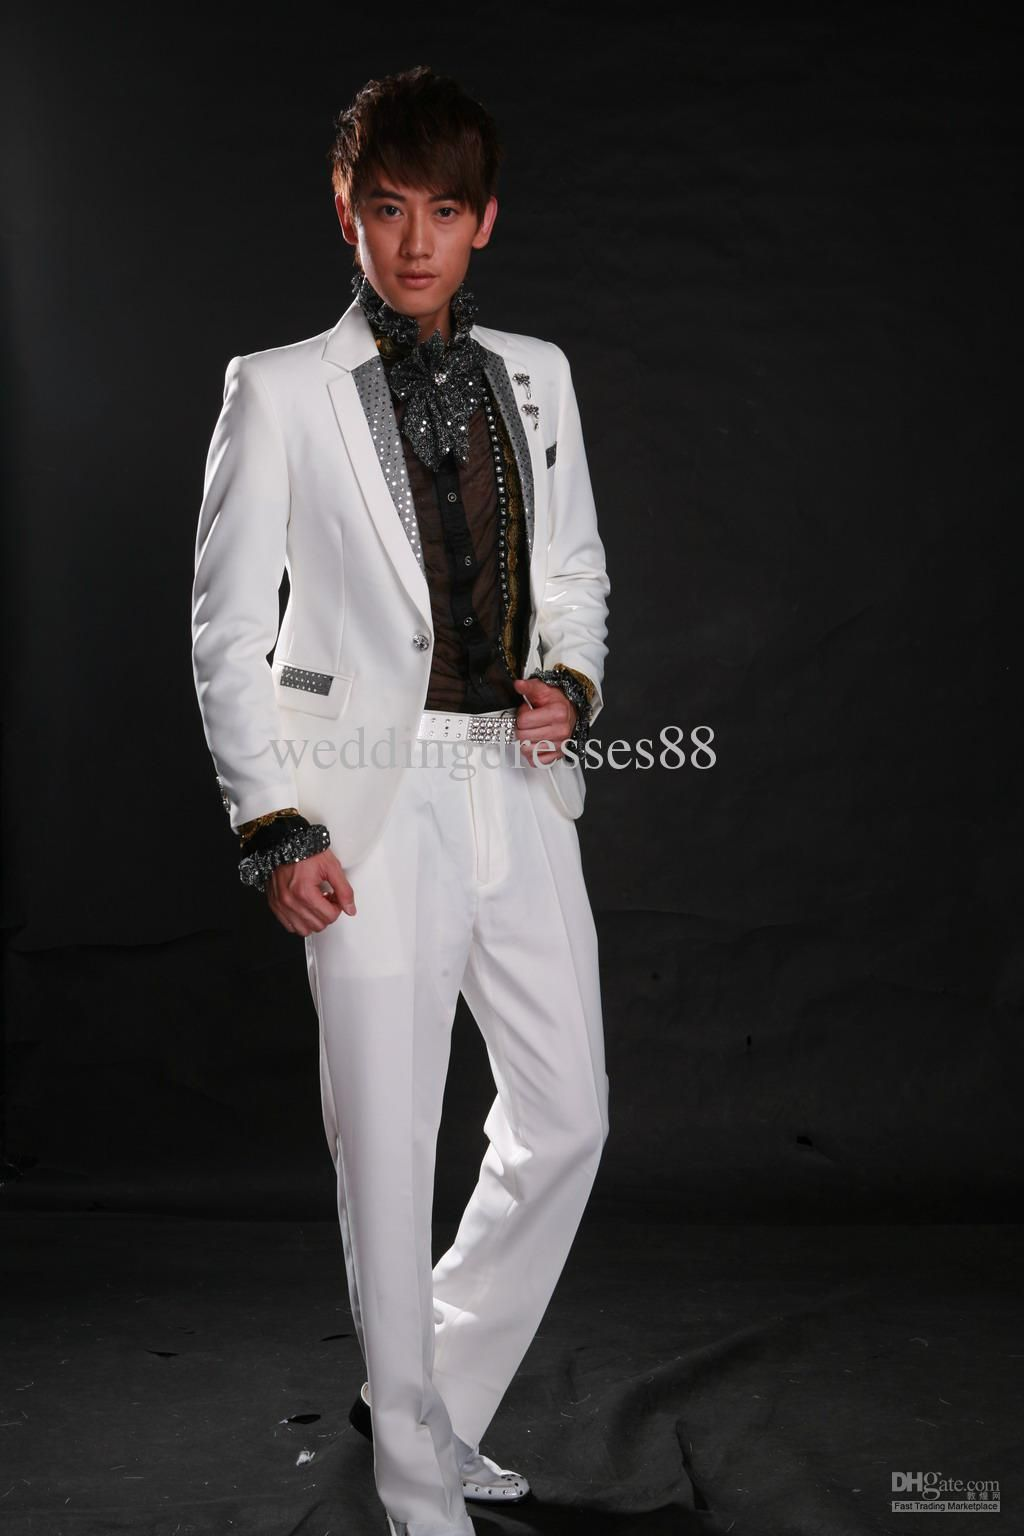 White Tuxedos BESTMAN | Wholesale Suits & Tuxedo - Buy Brand New ...